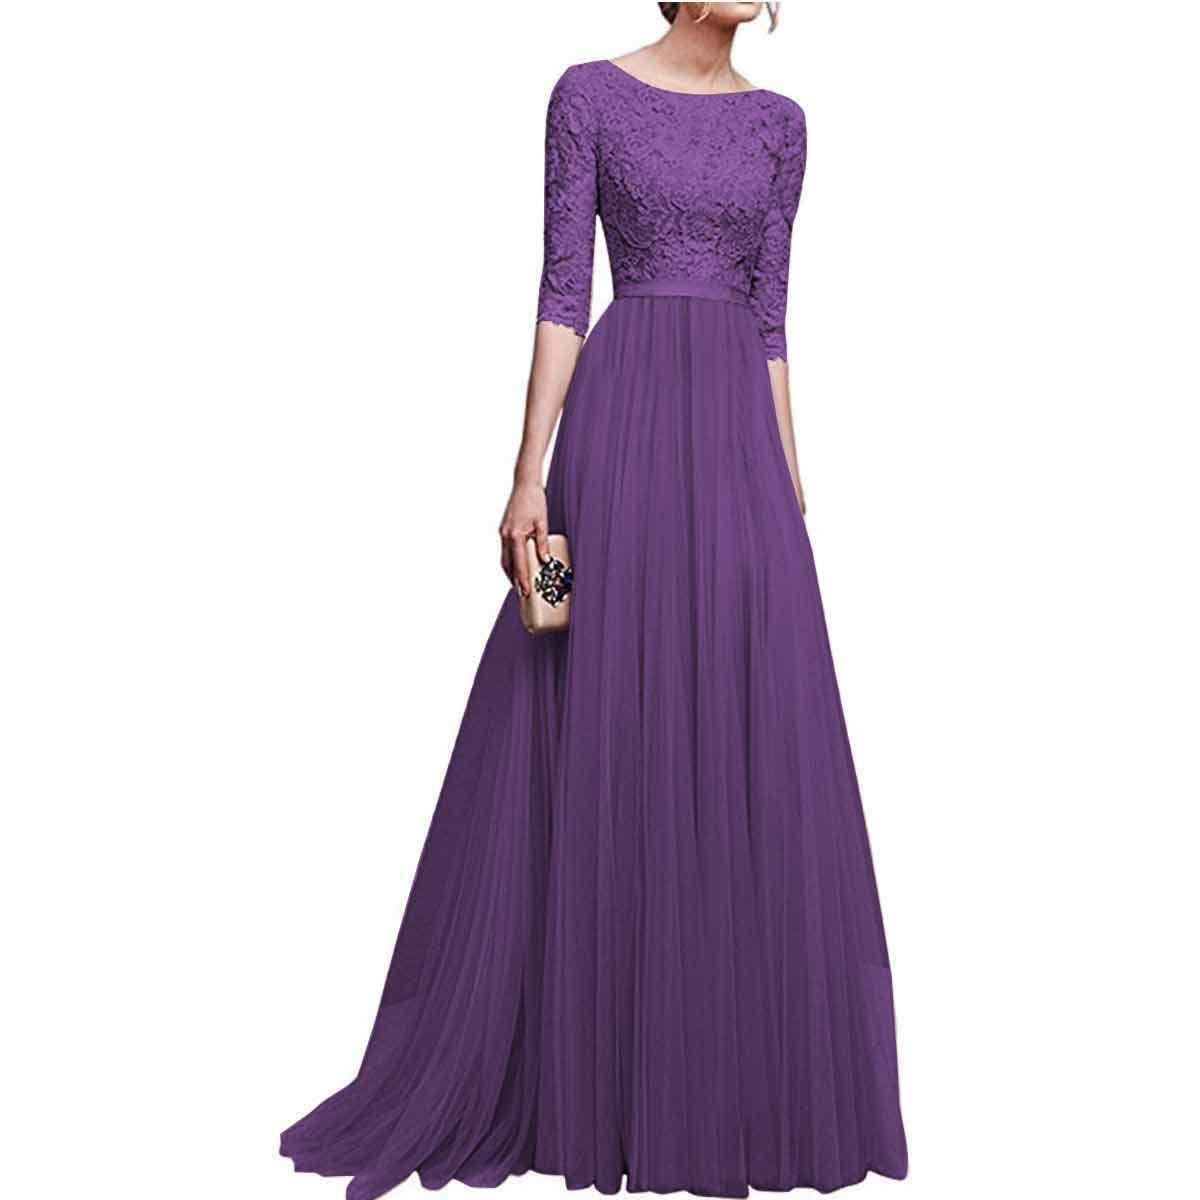 Jahurto Woemn Chiffon Bodycon Half Sleeve O Neck Evening Party Long Maxi Dress